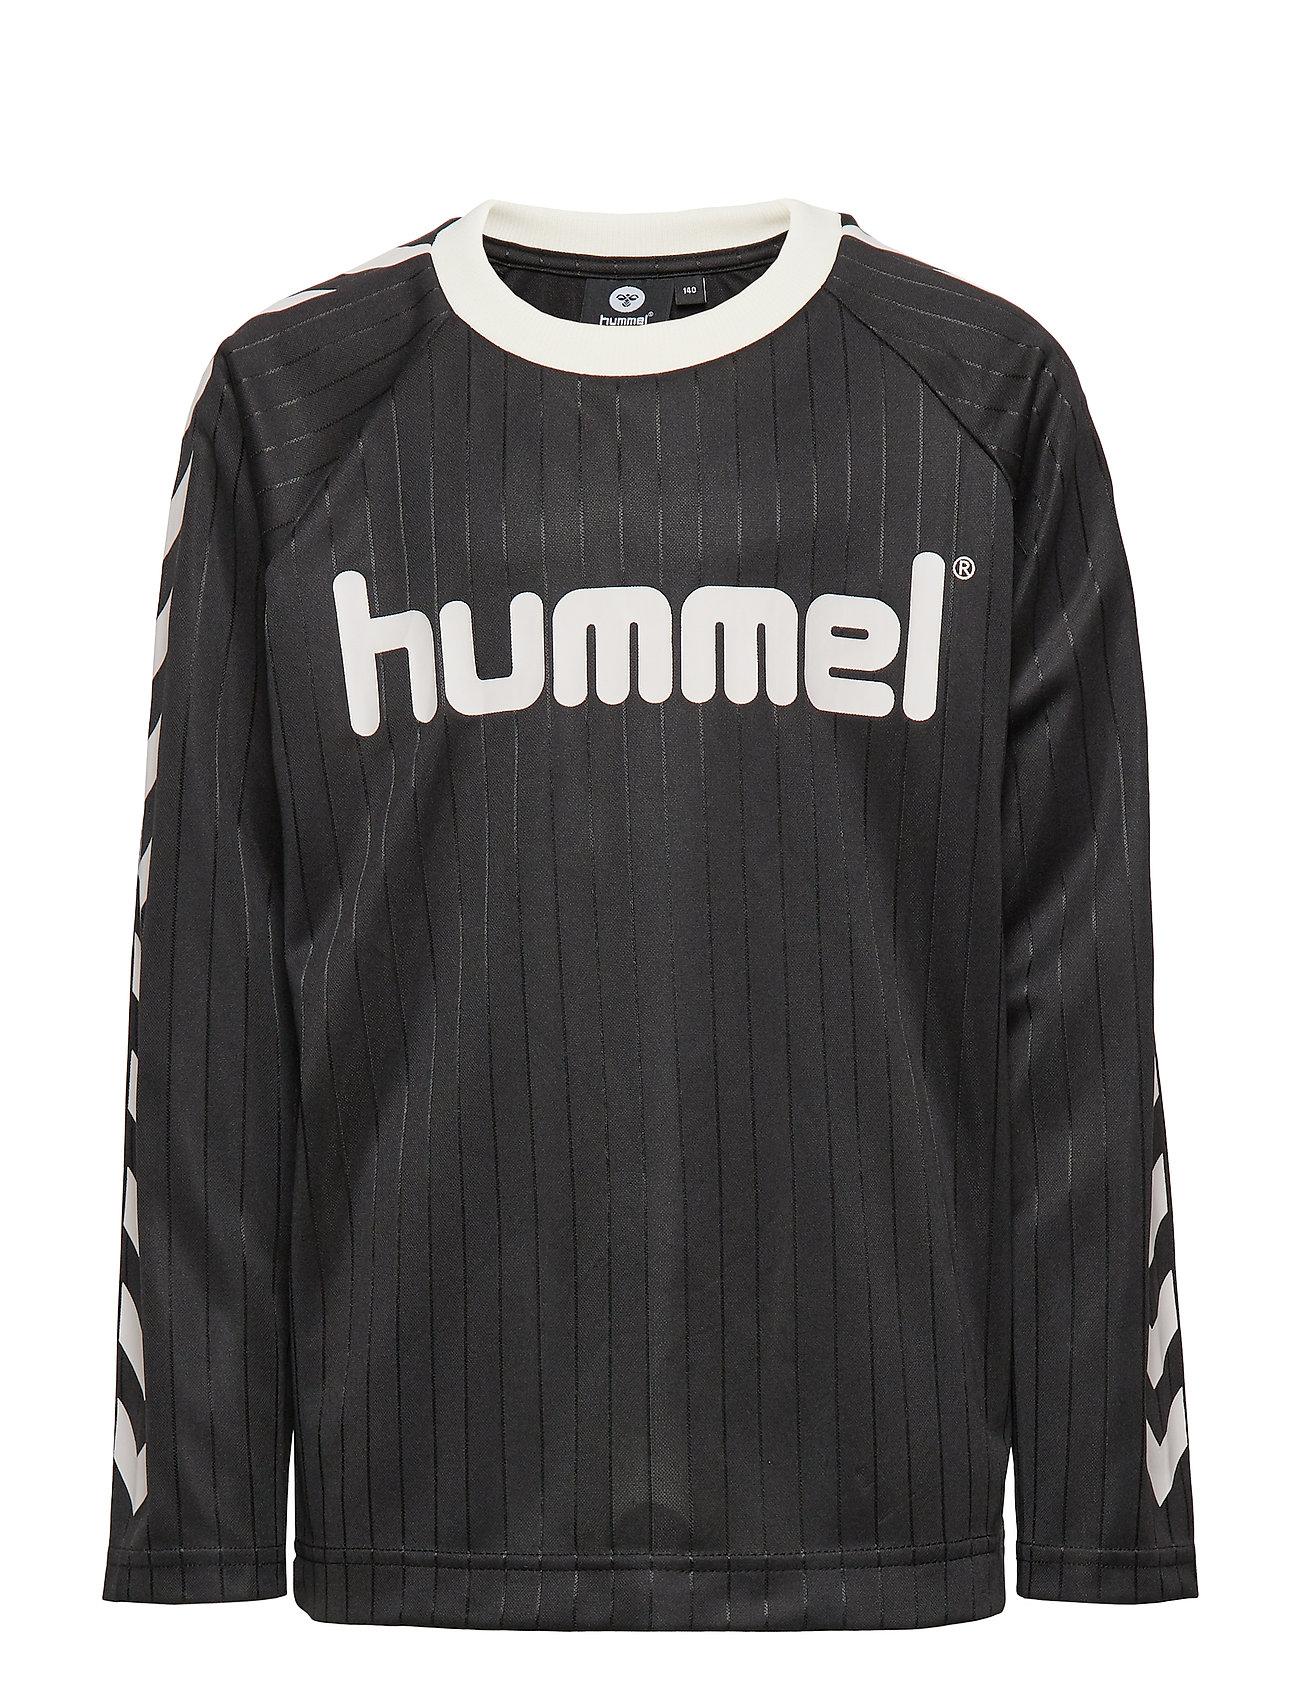 Hummel hmlCLARK T-SHIRT L/S - BLACK